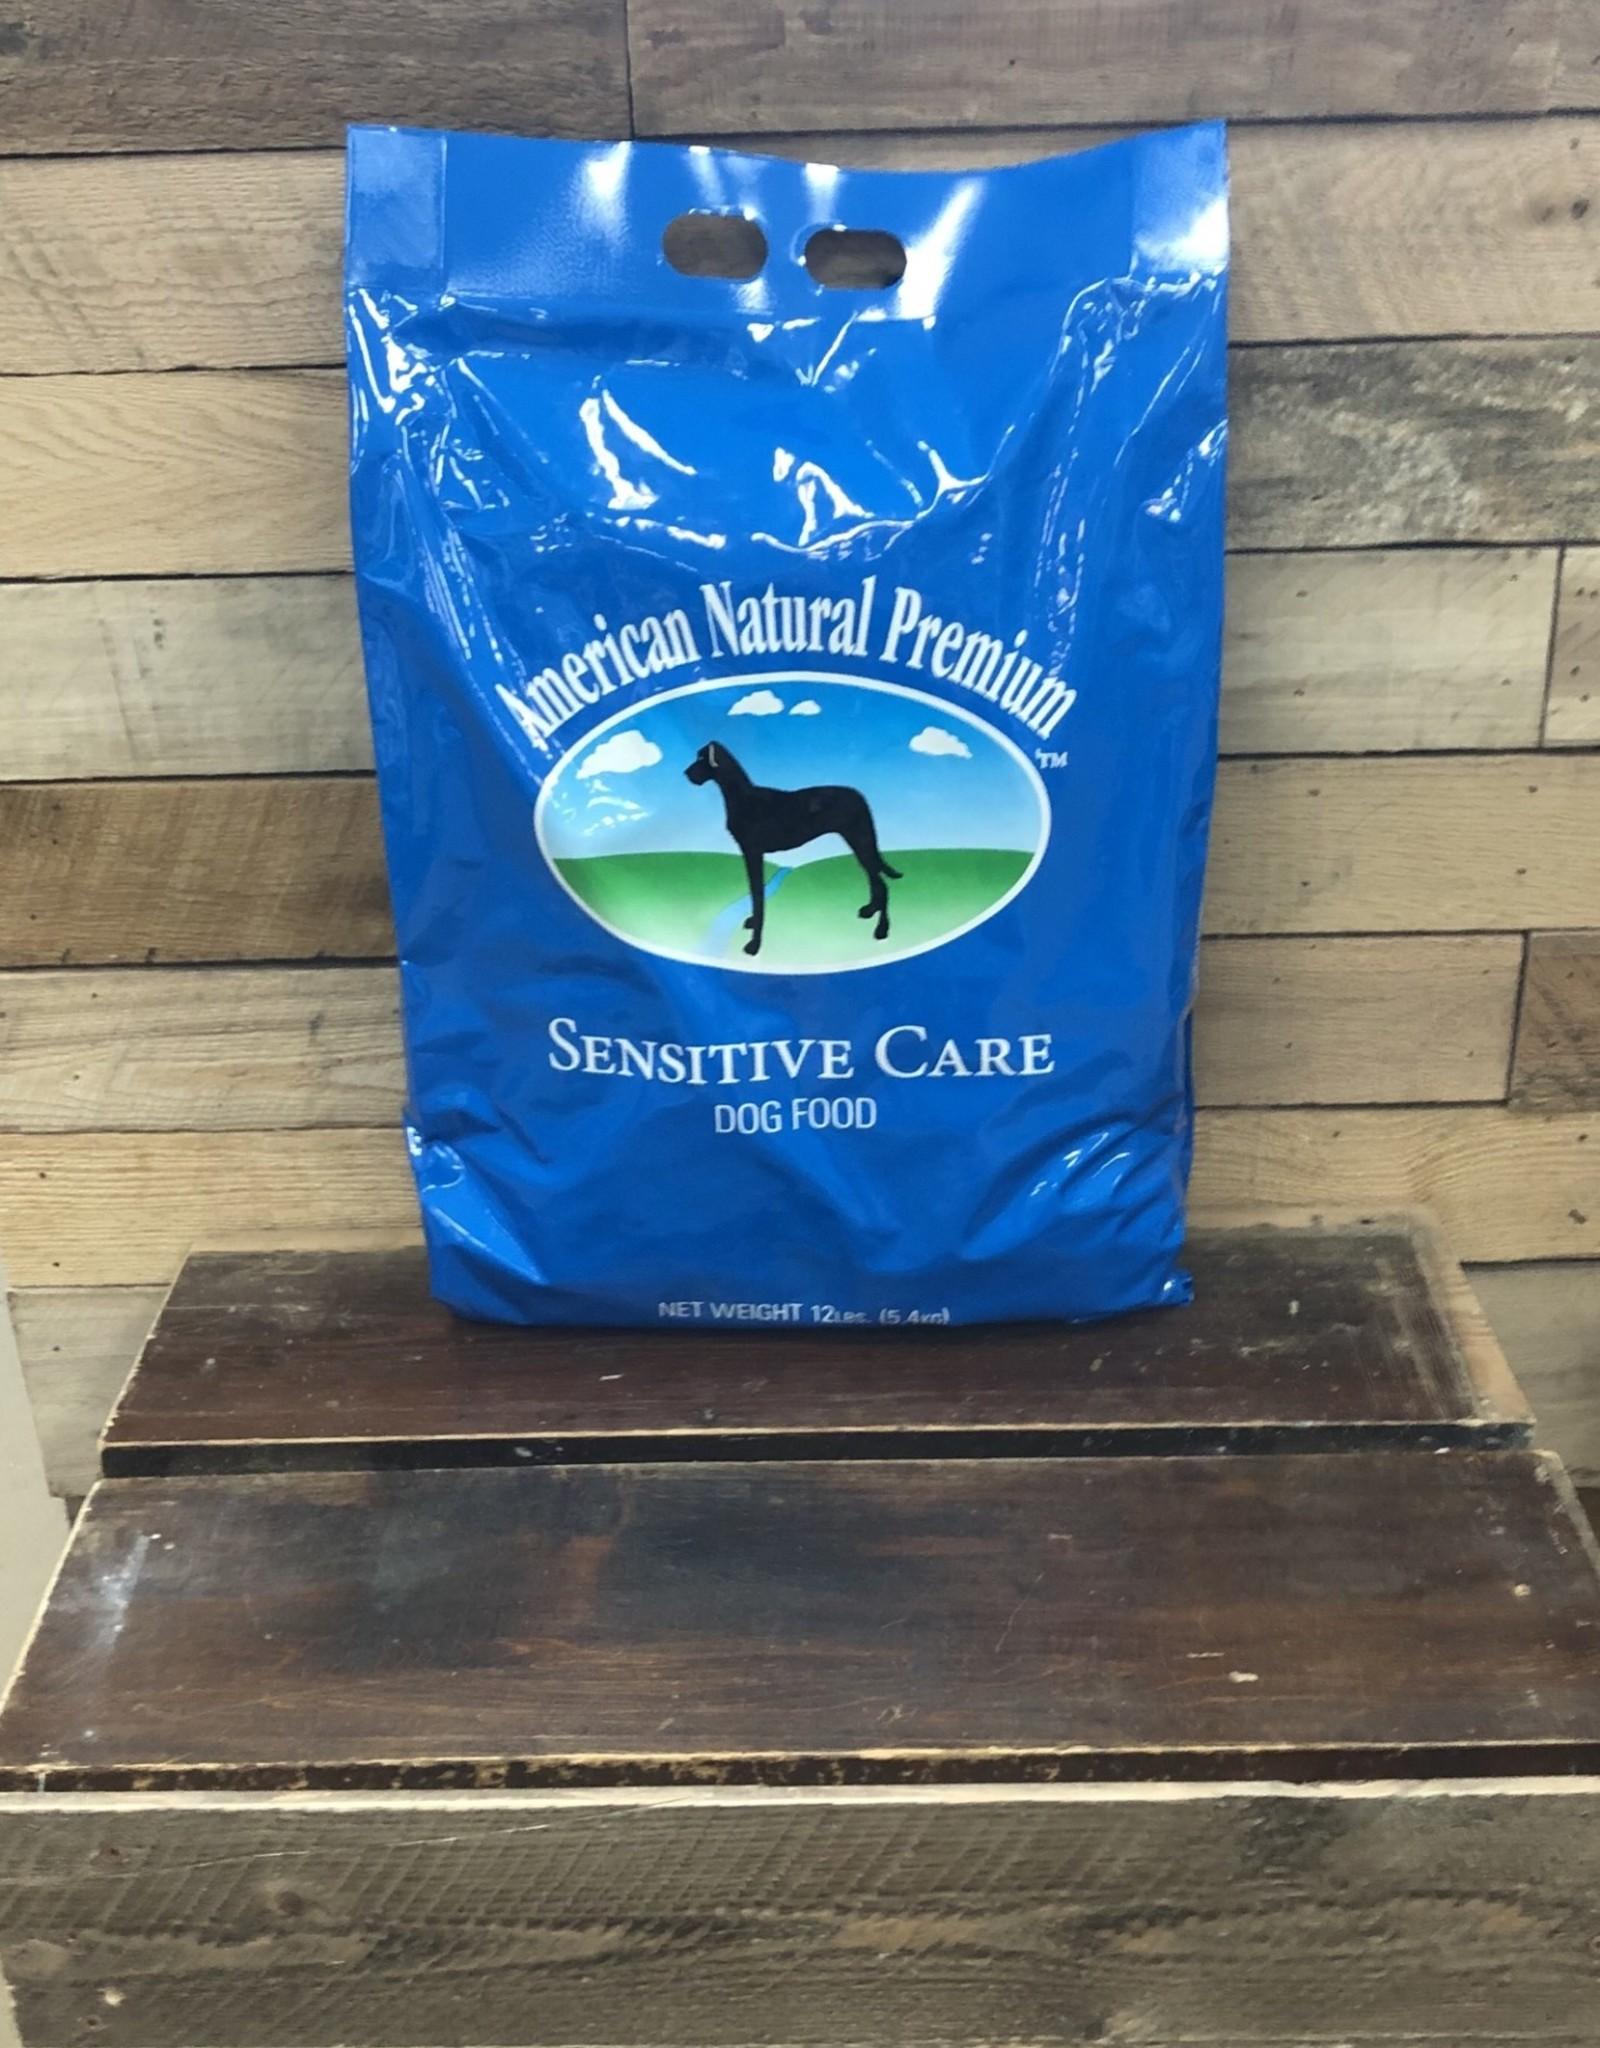 American Natural Premium American Natural Premium Sensitive Care- 3 sizes